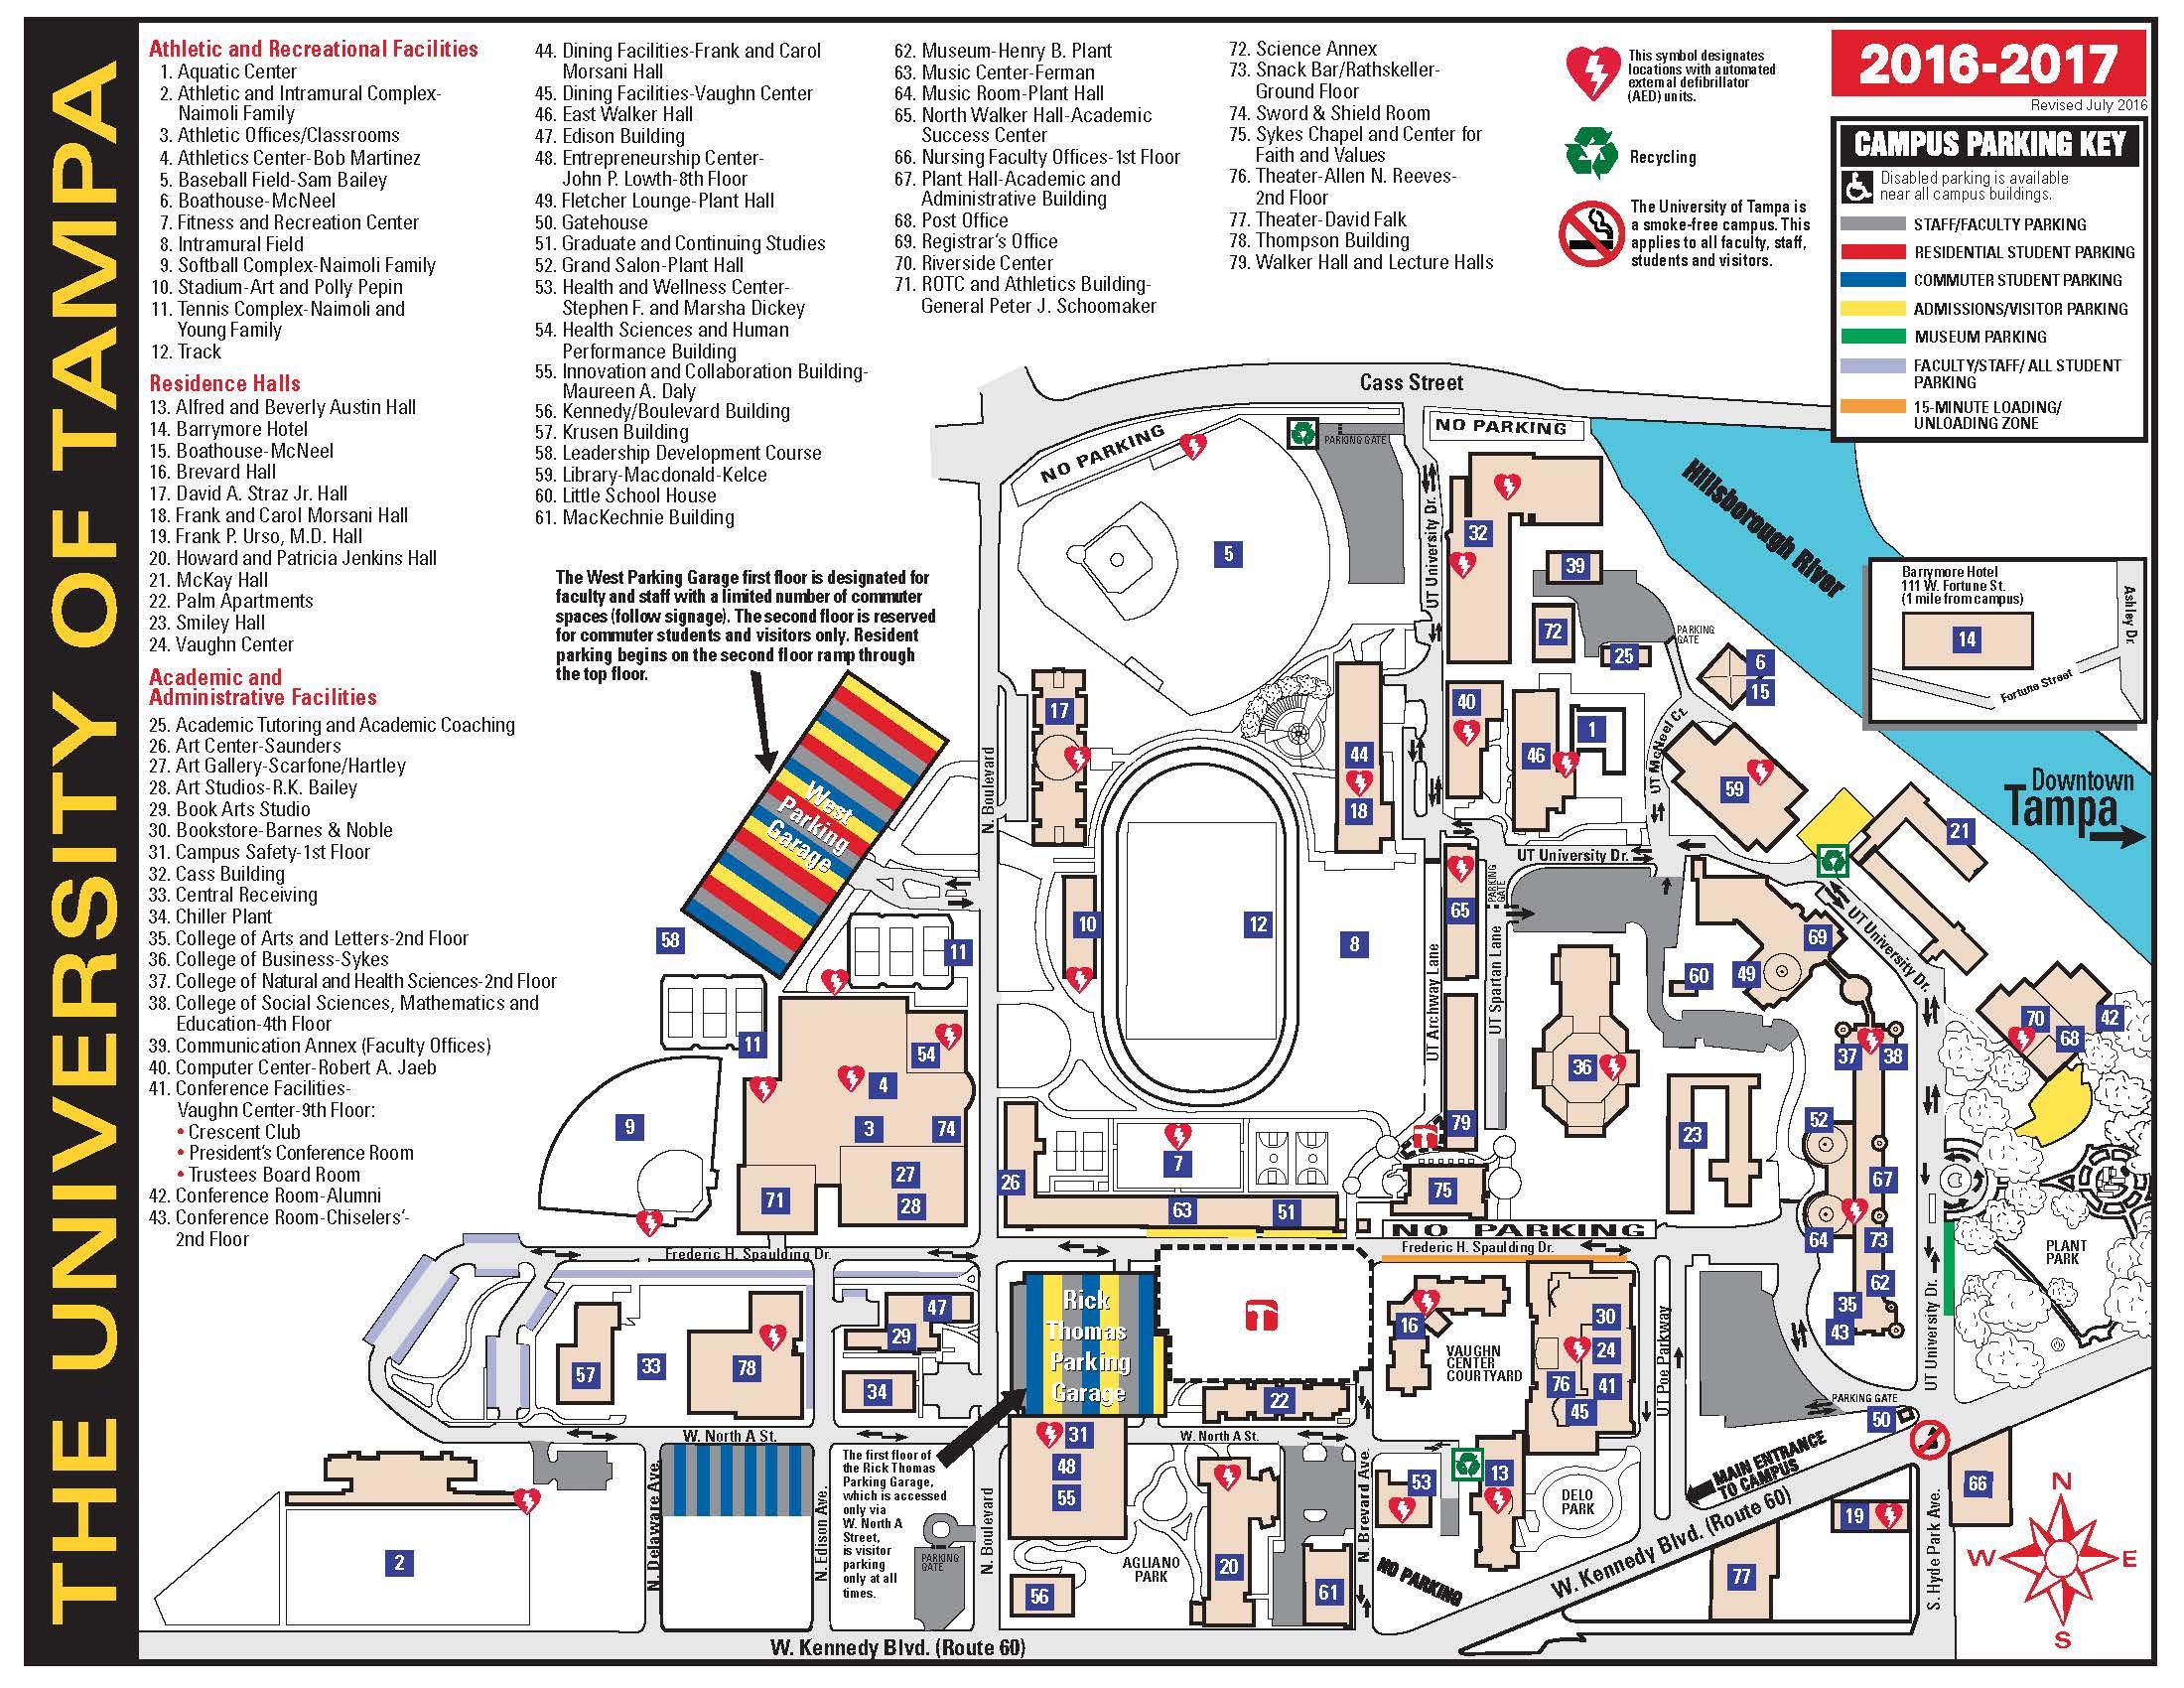 MyUT: UT Map on u of toronto campus map, u of missouri campus map, university of south florida campus map, boston u campus map, u of minn campus map, u of dayton campus map, university of wisconsin madison map, u pa campus map, u of akron campus map, liberty u campus map, florida state campus map, university of west florida map,